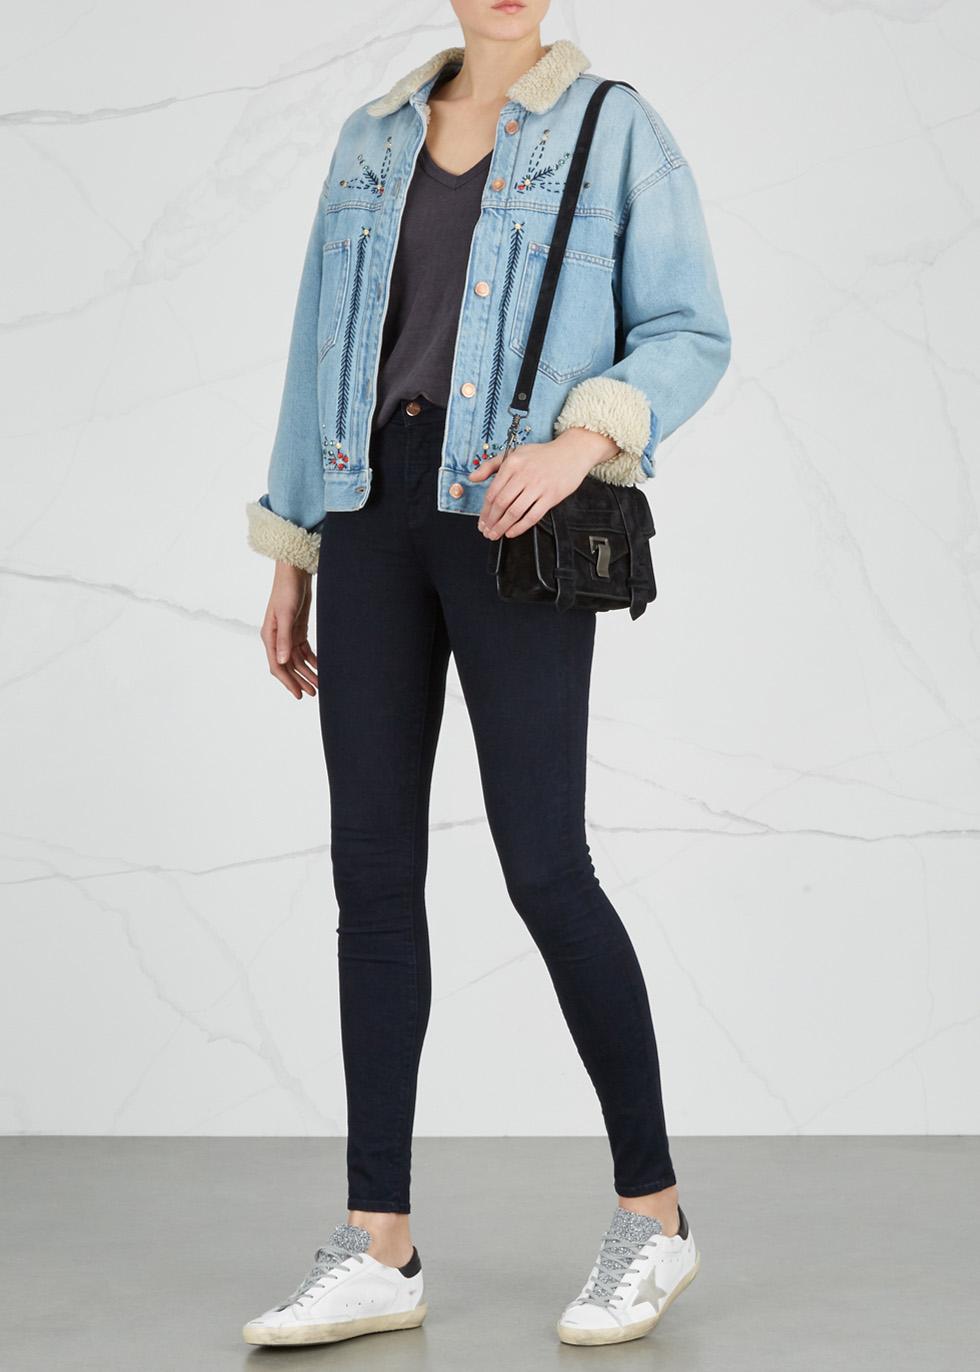 Maria indigo high-rise skinny jeans - J Brand